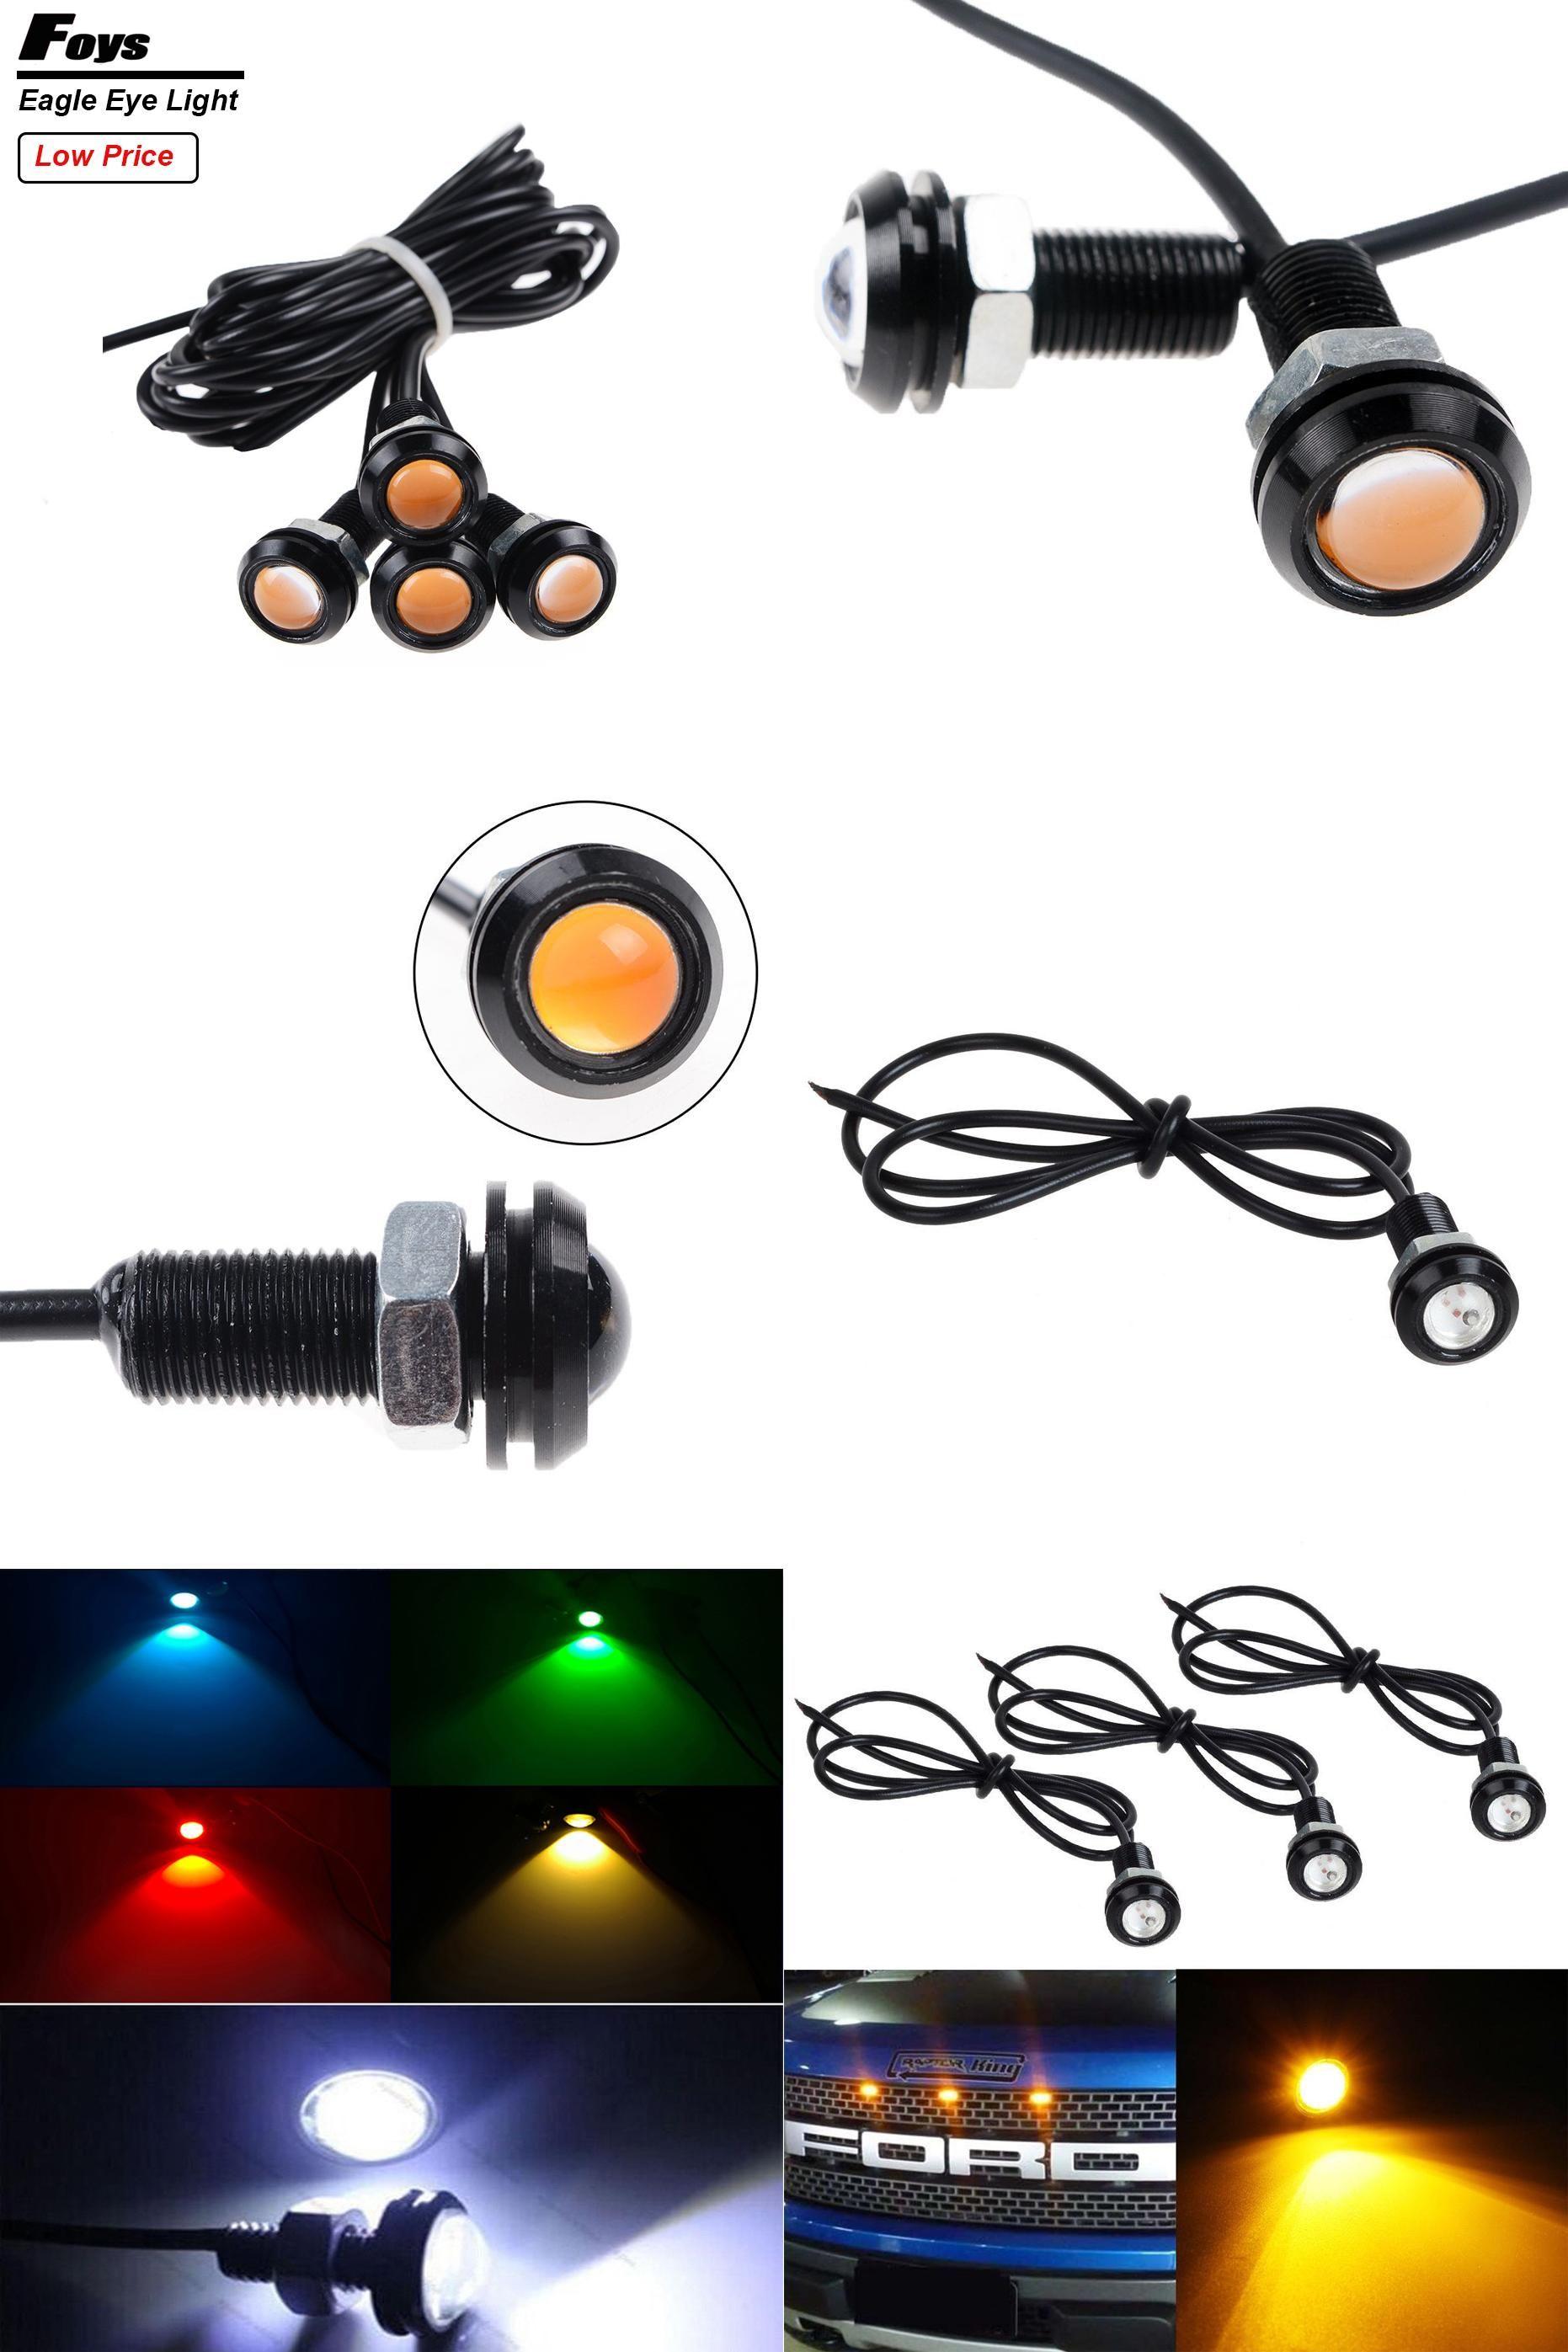 [Visit To Buy] 1 Pcs Car Styling Led Eagle Eye DRL Daytime Running Lights  Source Backup Reversing Parking Signal Lamps Waterproof